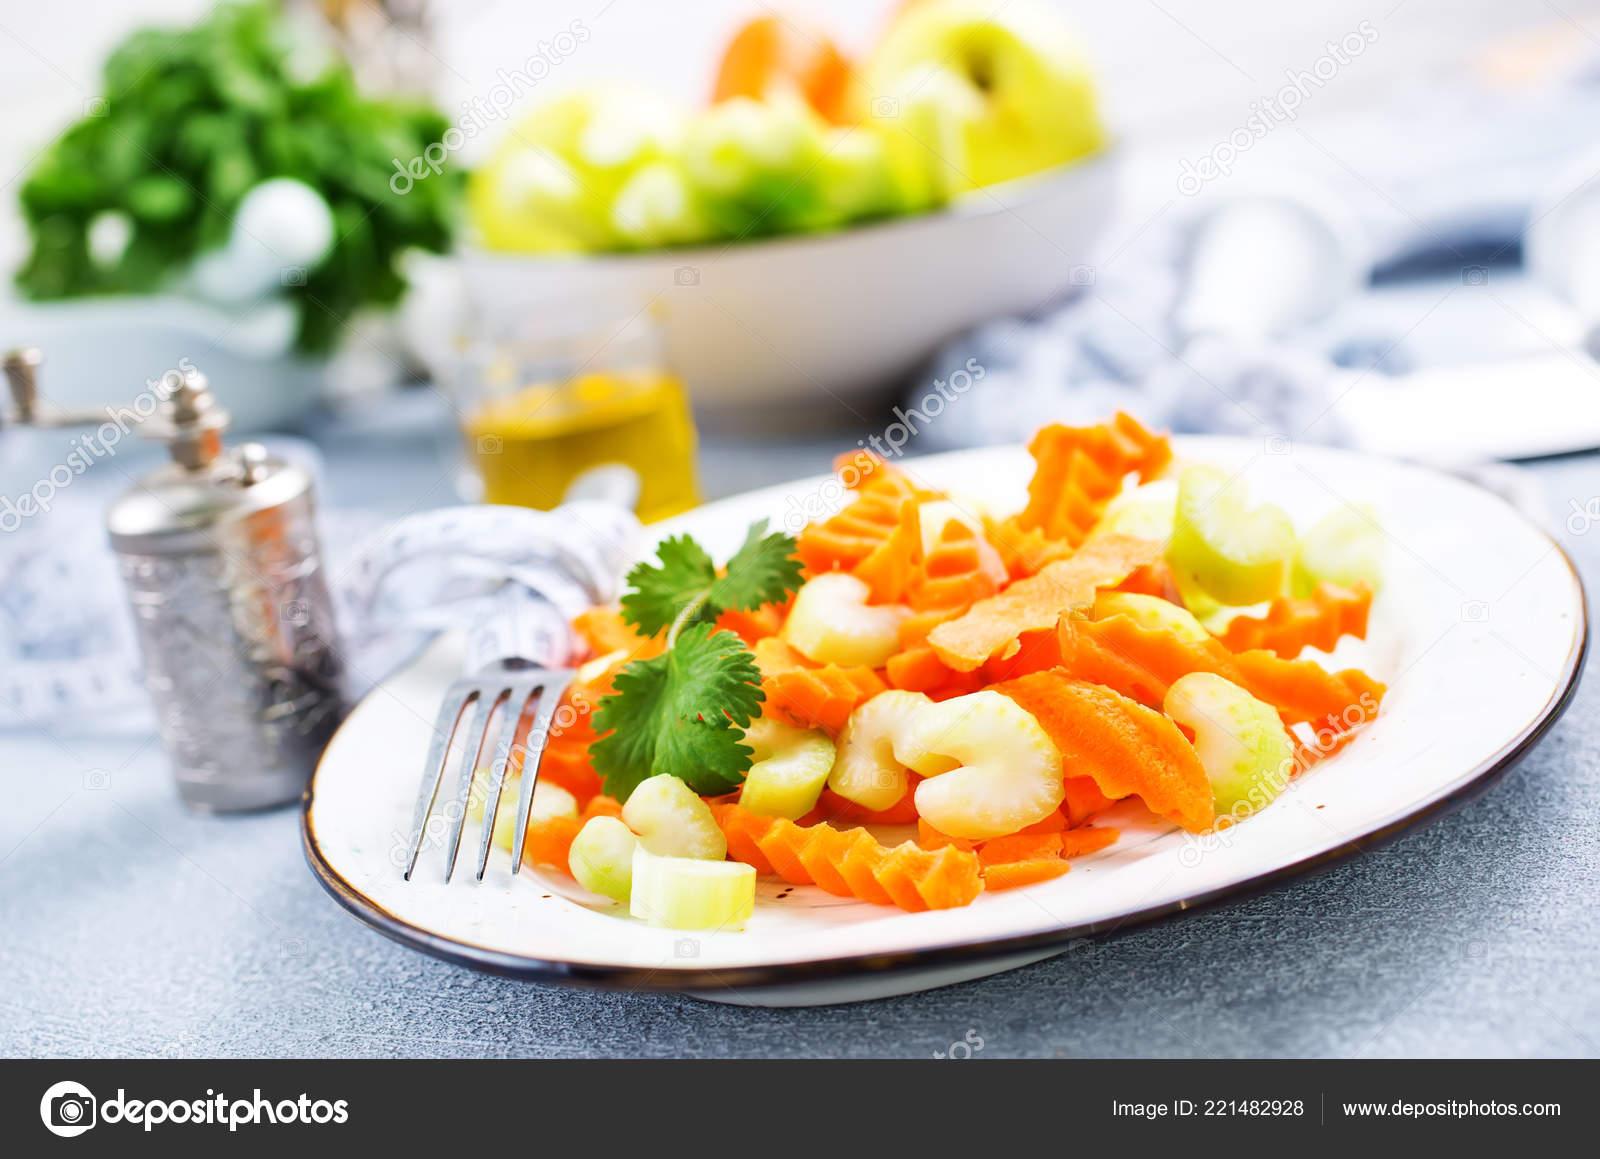 Dieta de zanahoria y apio